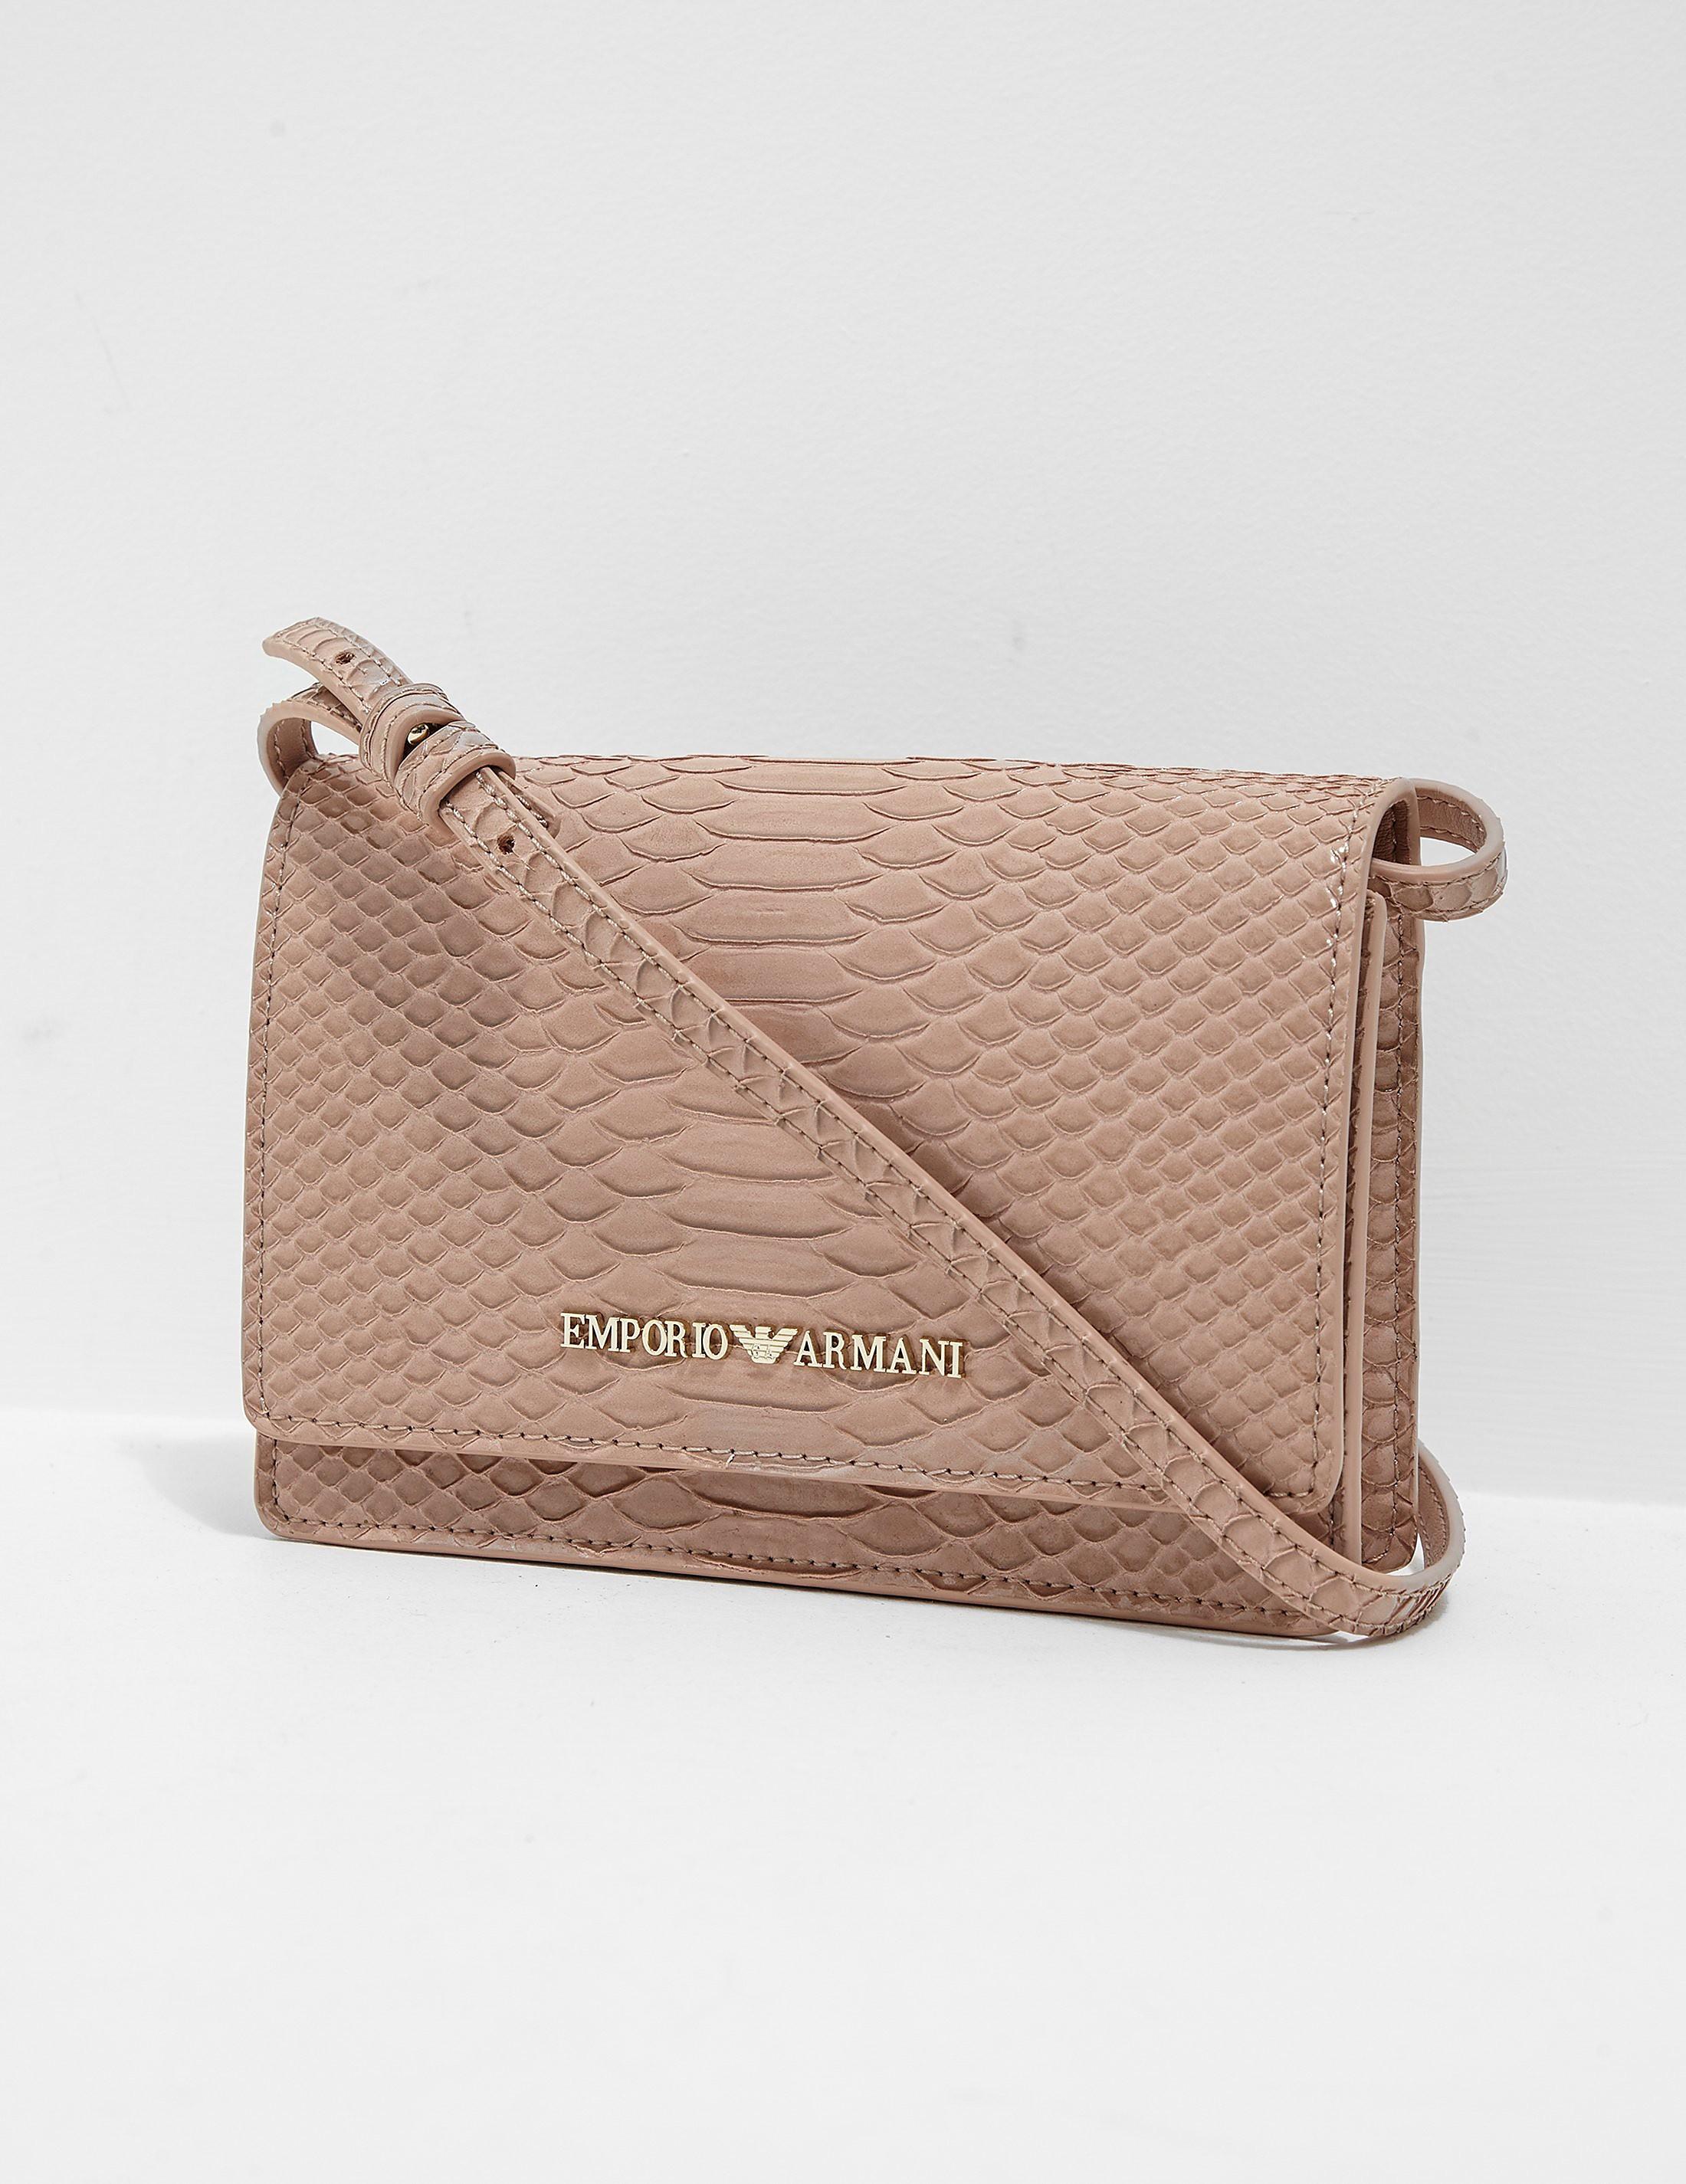 Emporio Armani Snakeskin Crossbody Bag